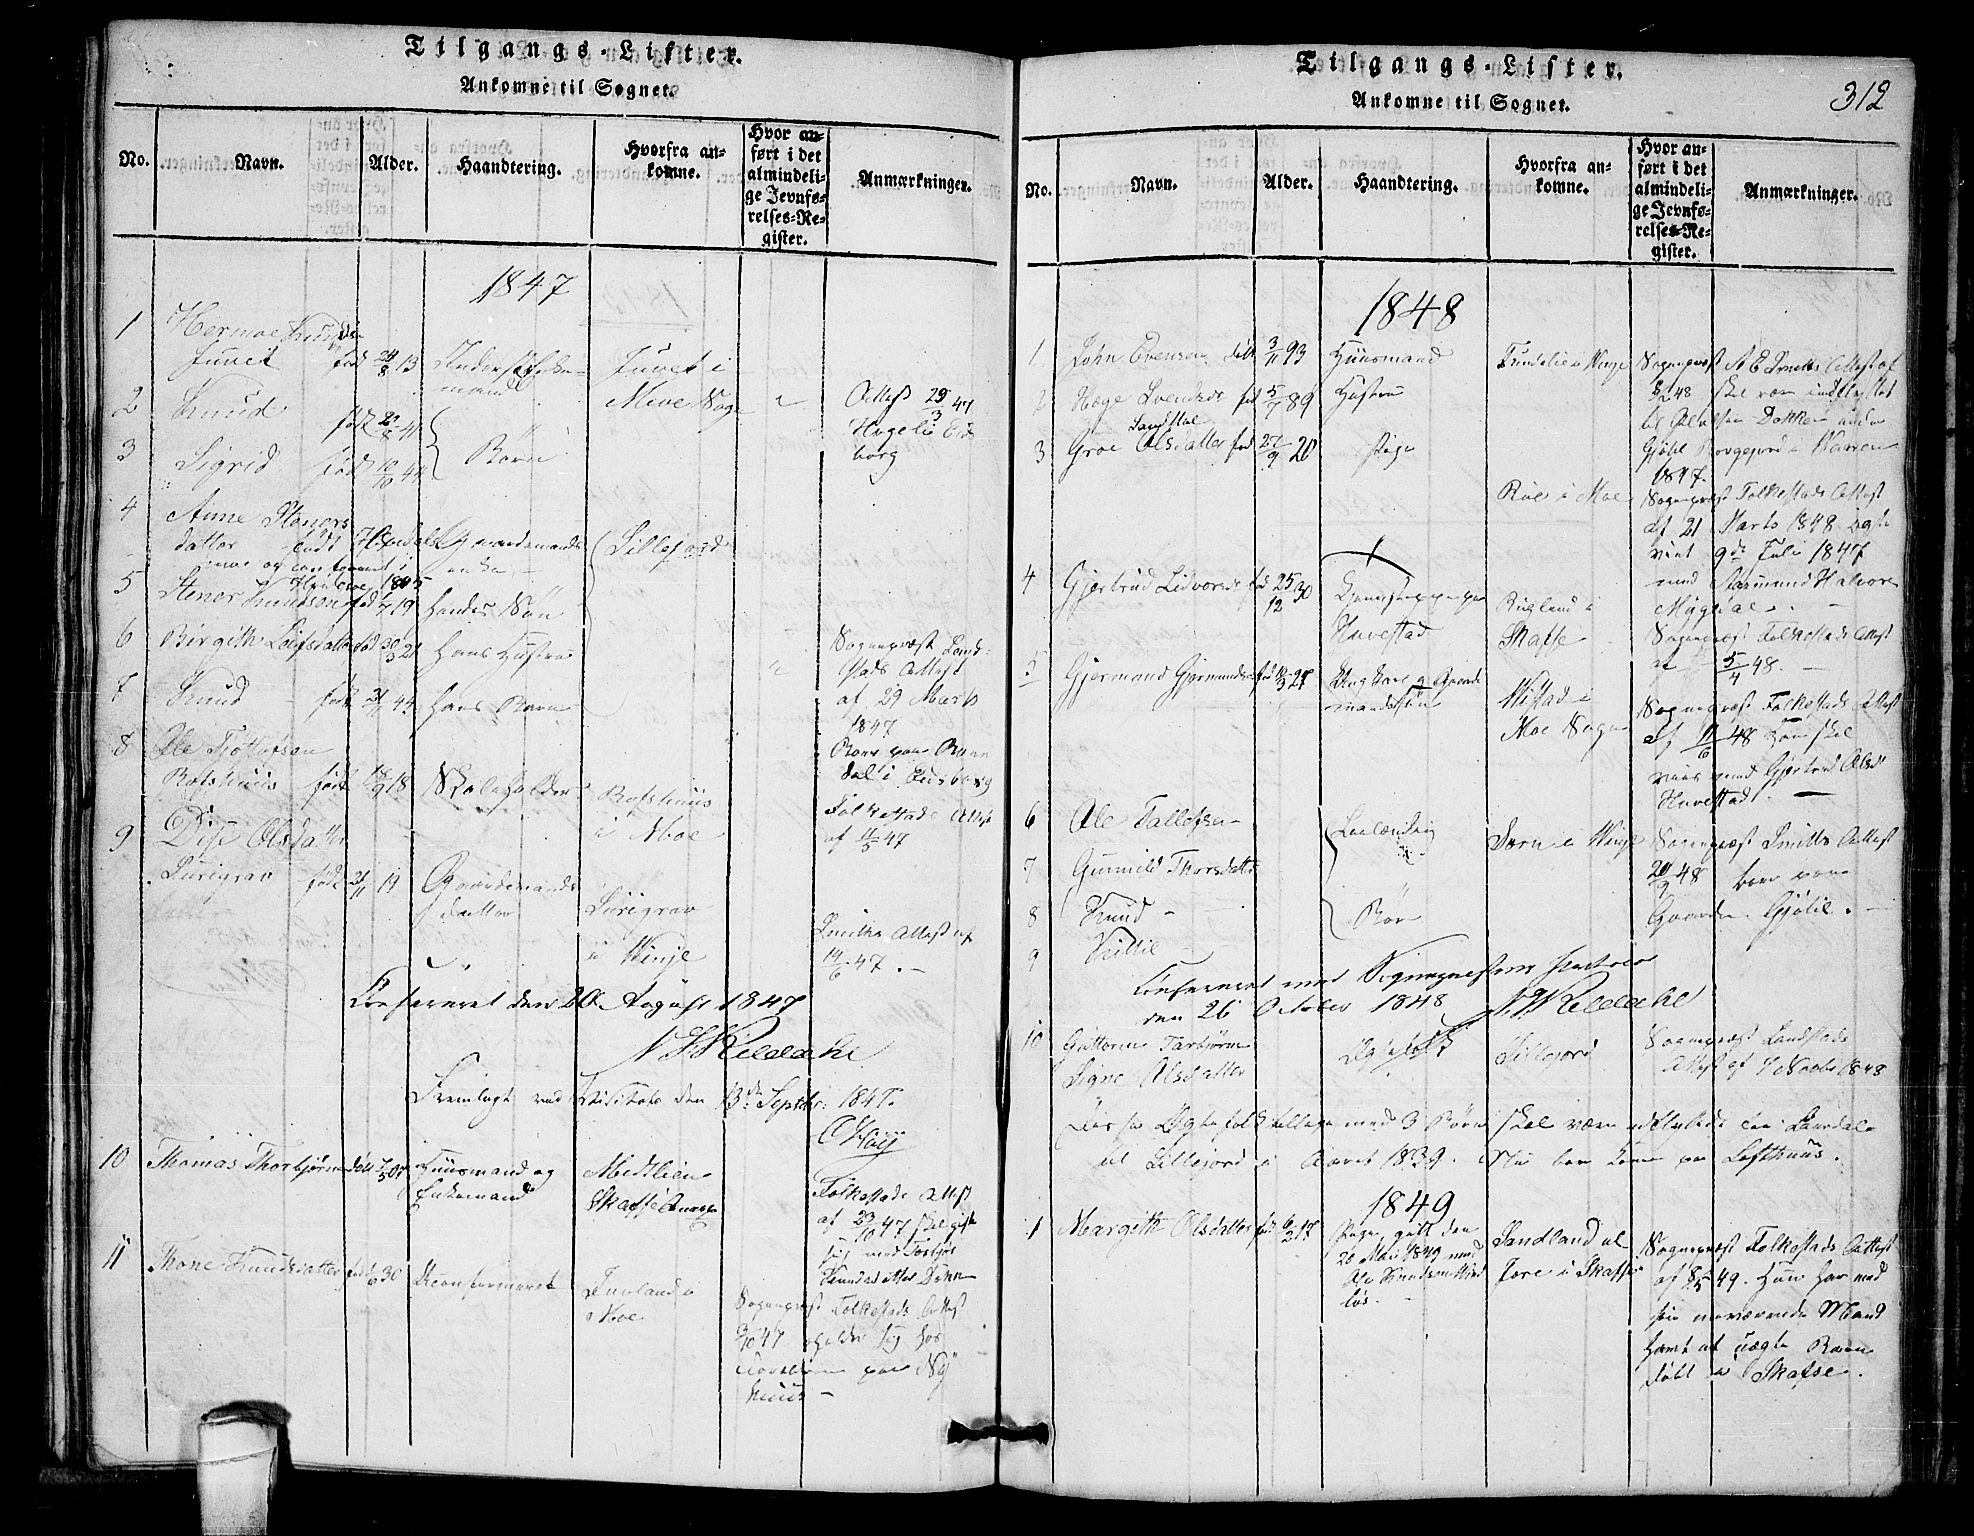 SAKO, Lårdal kirkebøker, G/Gb/L0001: Klokkerbok nr. II 1, 1815-1865, s. 312